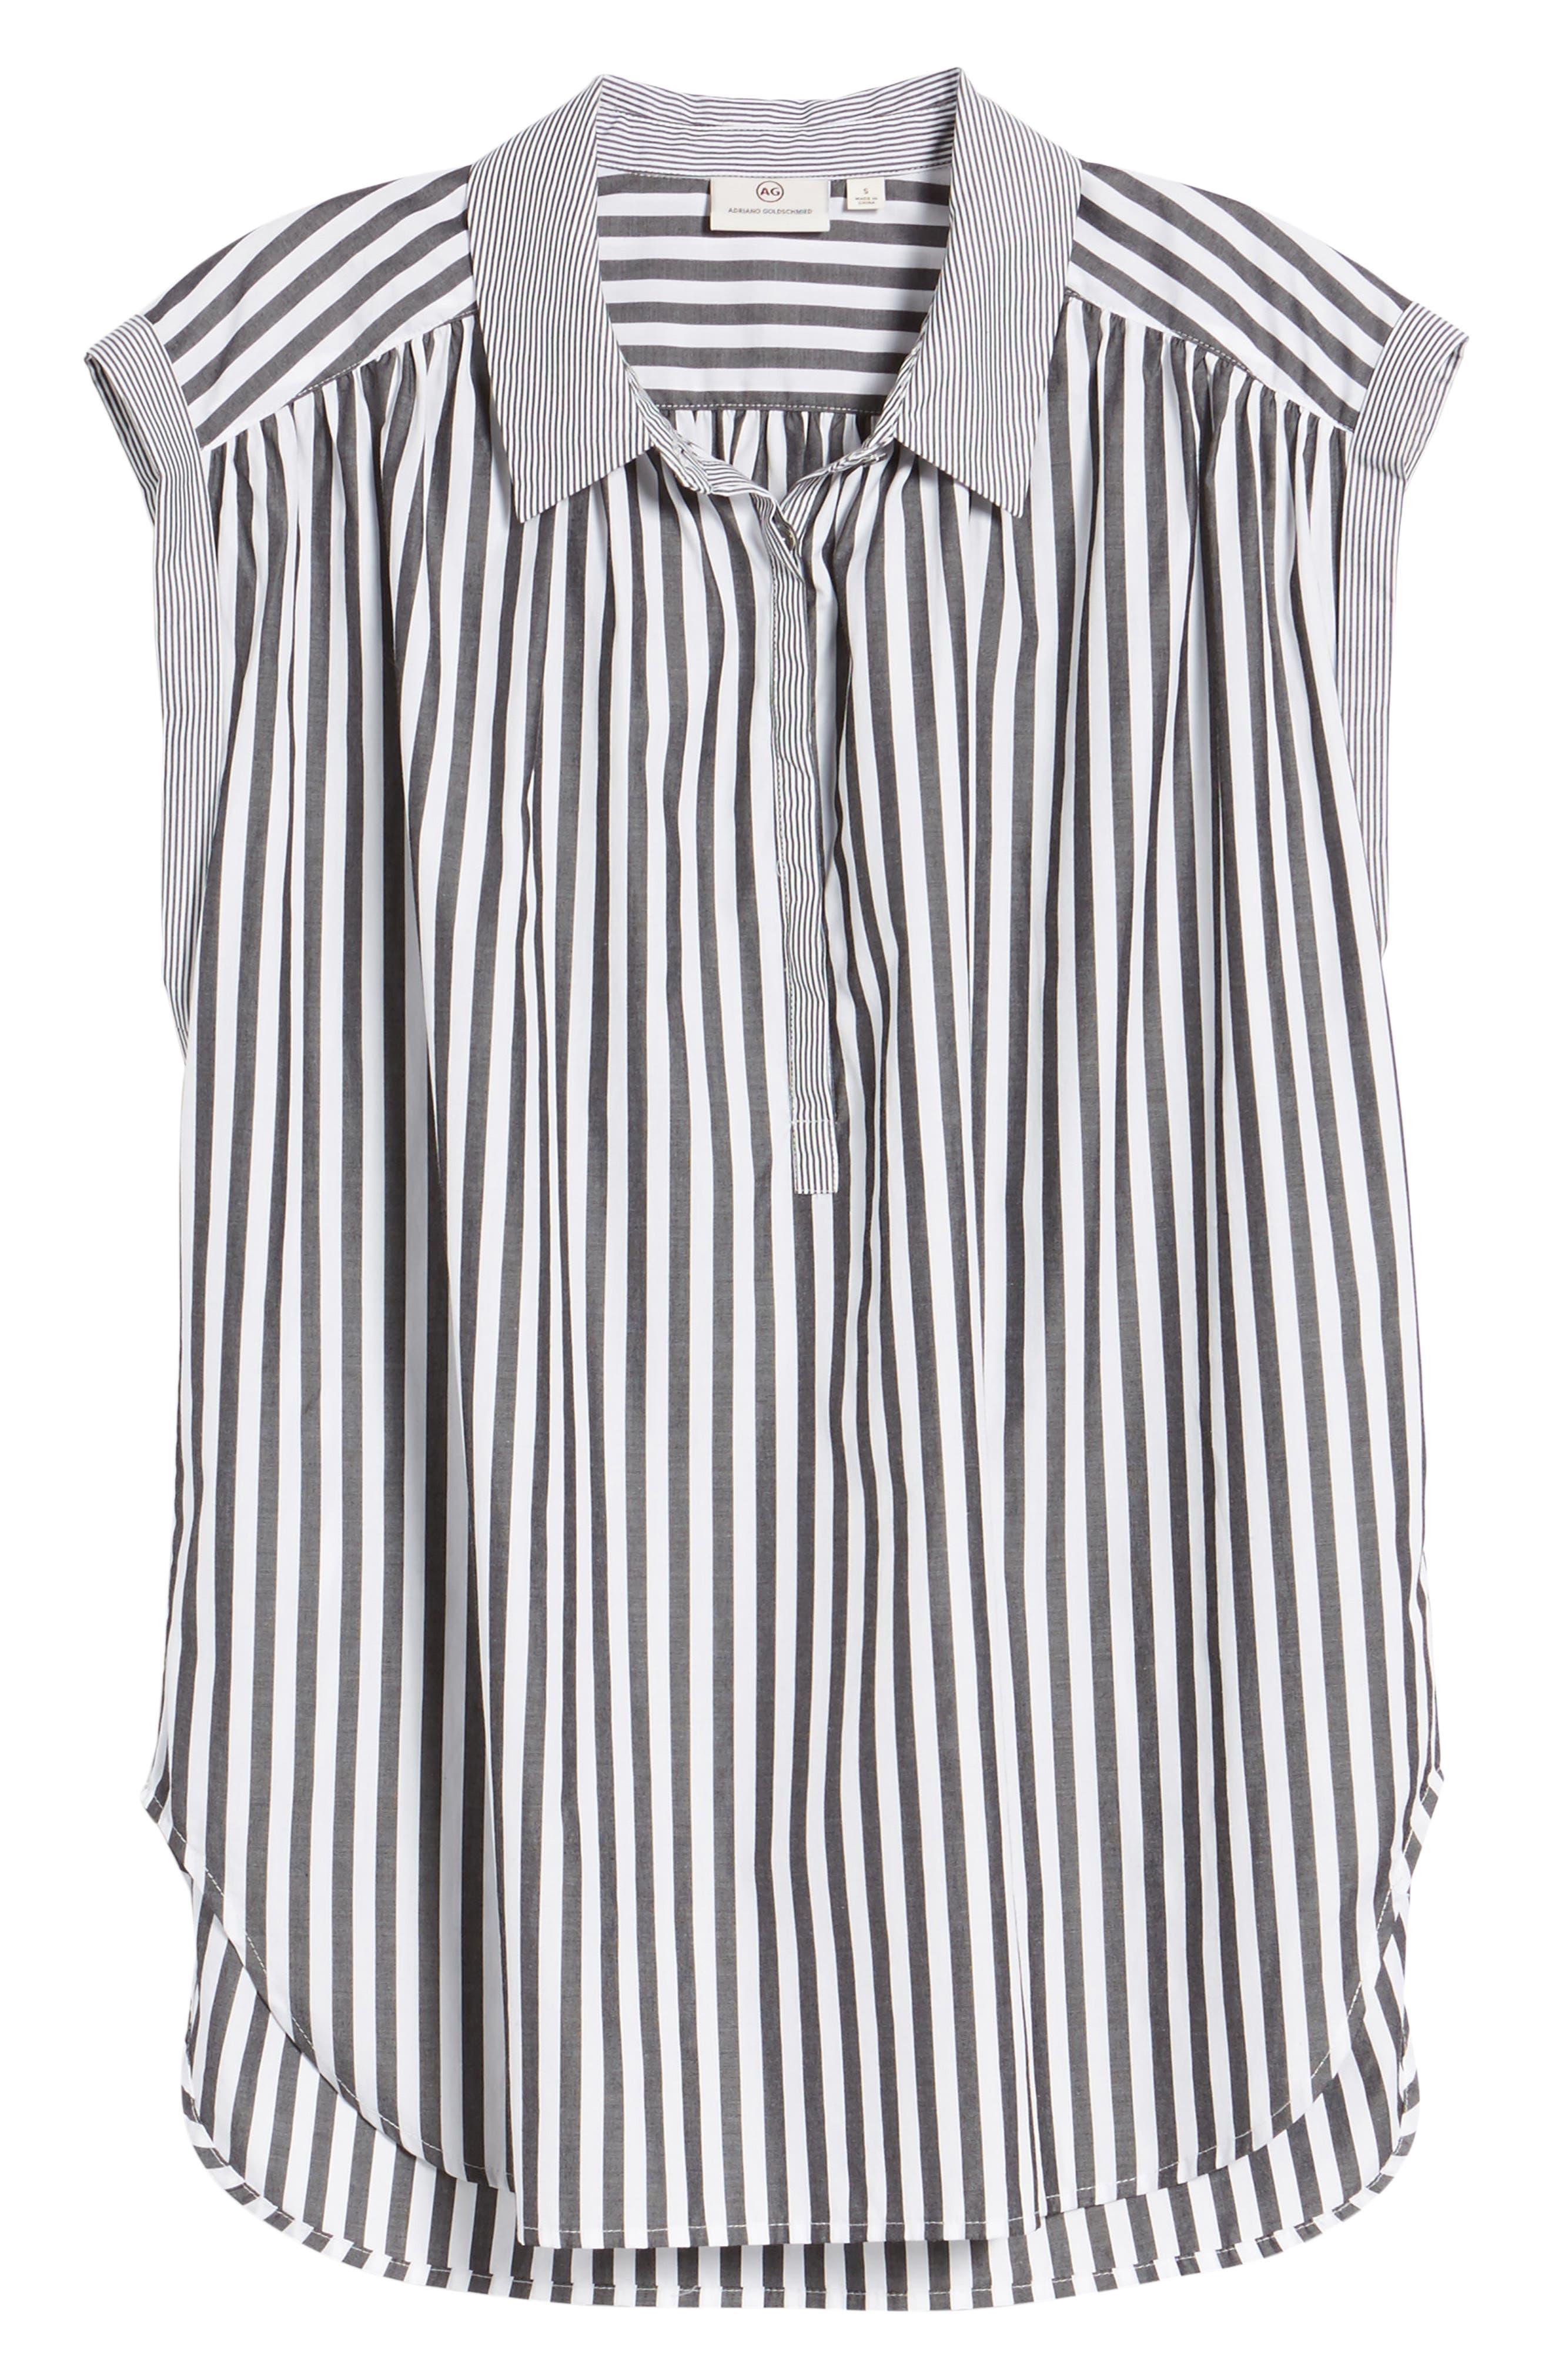 Abigail Stripe Top,                             Alternate thumbnail 6, color,                             Black/ White